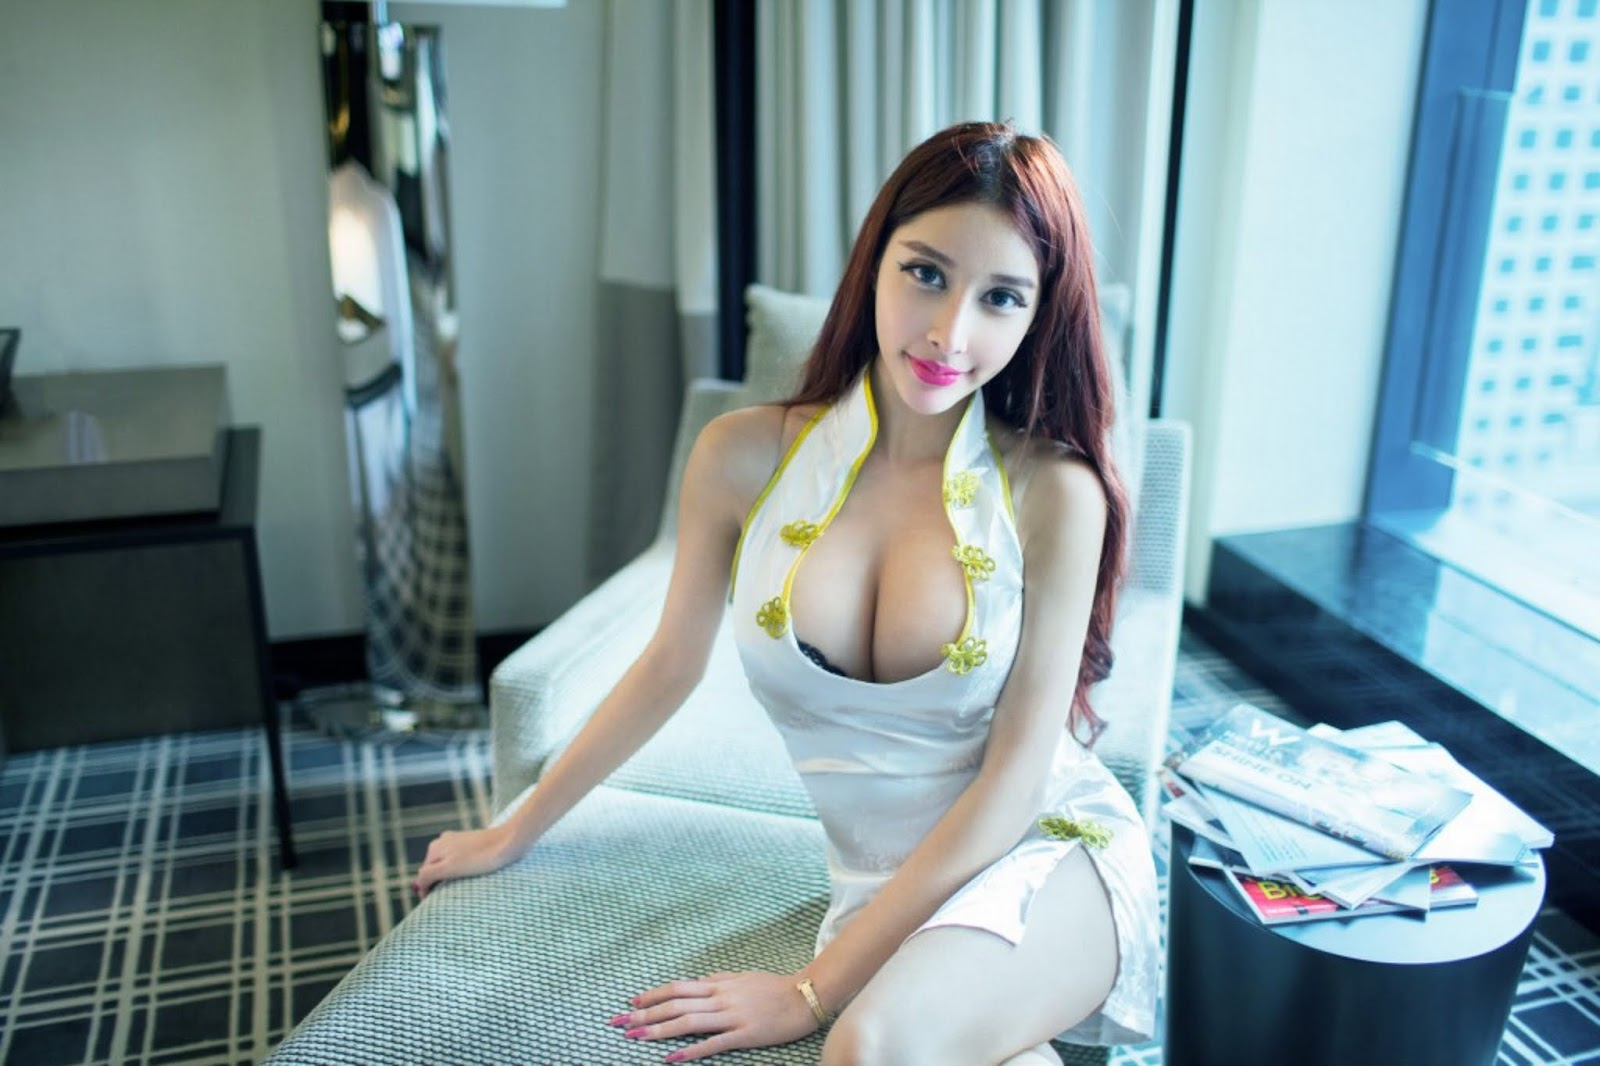 %25C2%25B1 %25C2%25B1 10 - Model Nude TUIGIRL NO.49 Beauty Body Tits